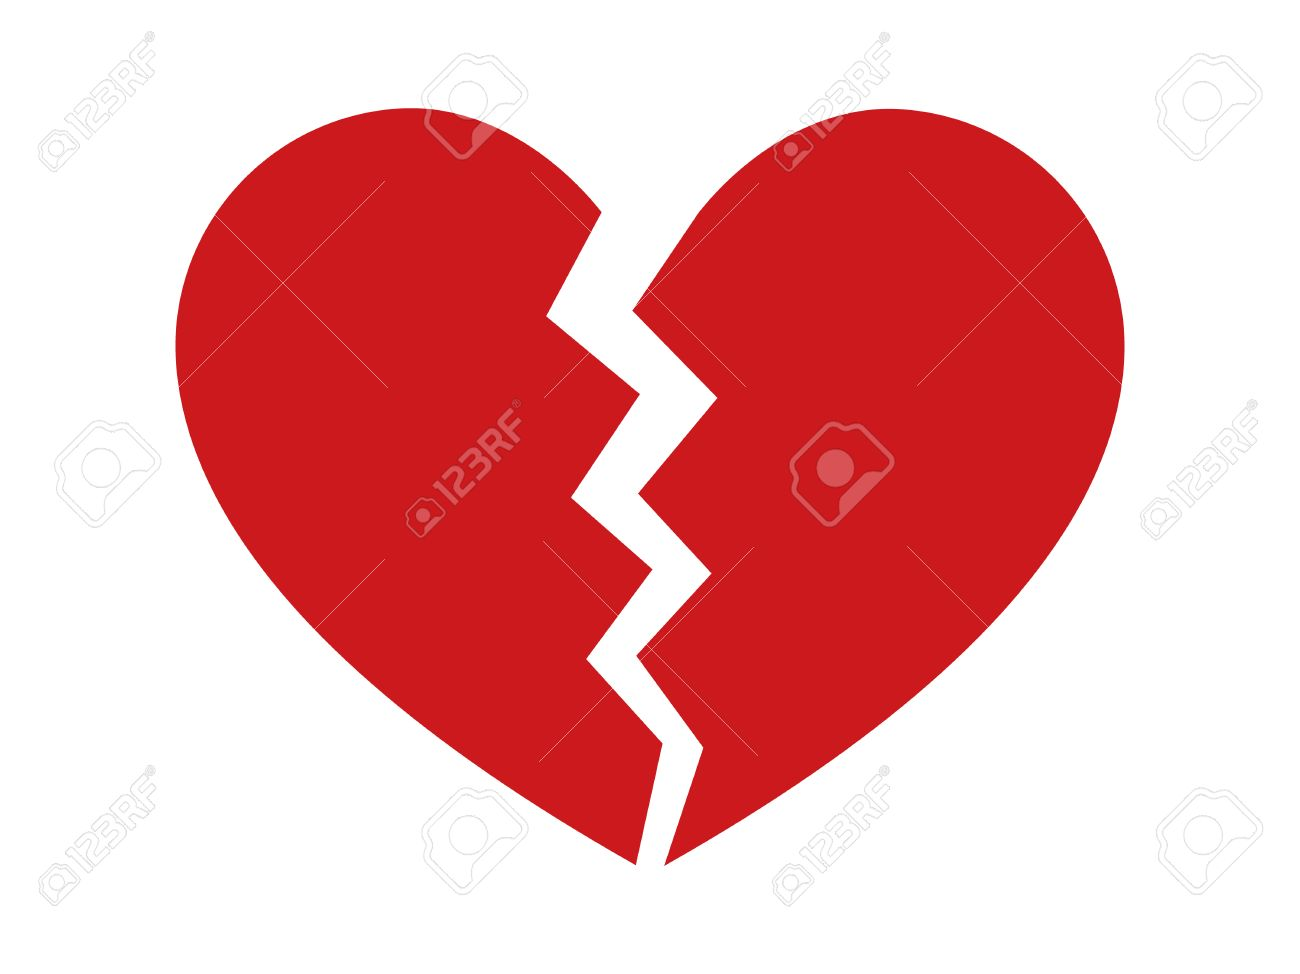 Red heartbreak / heart break or divorce flat icon for apps and websites - 58945132